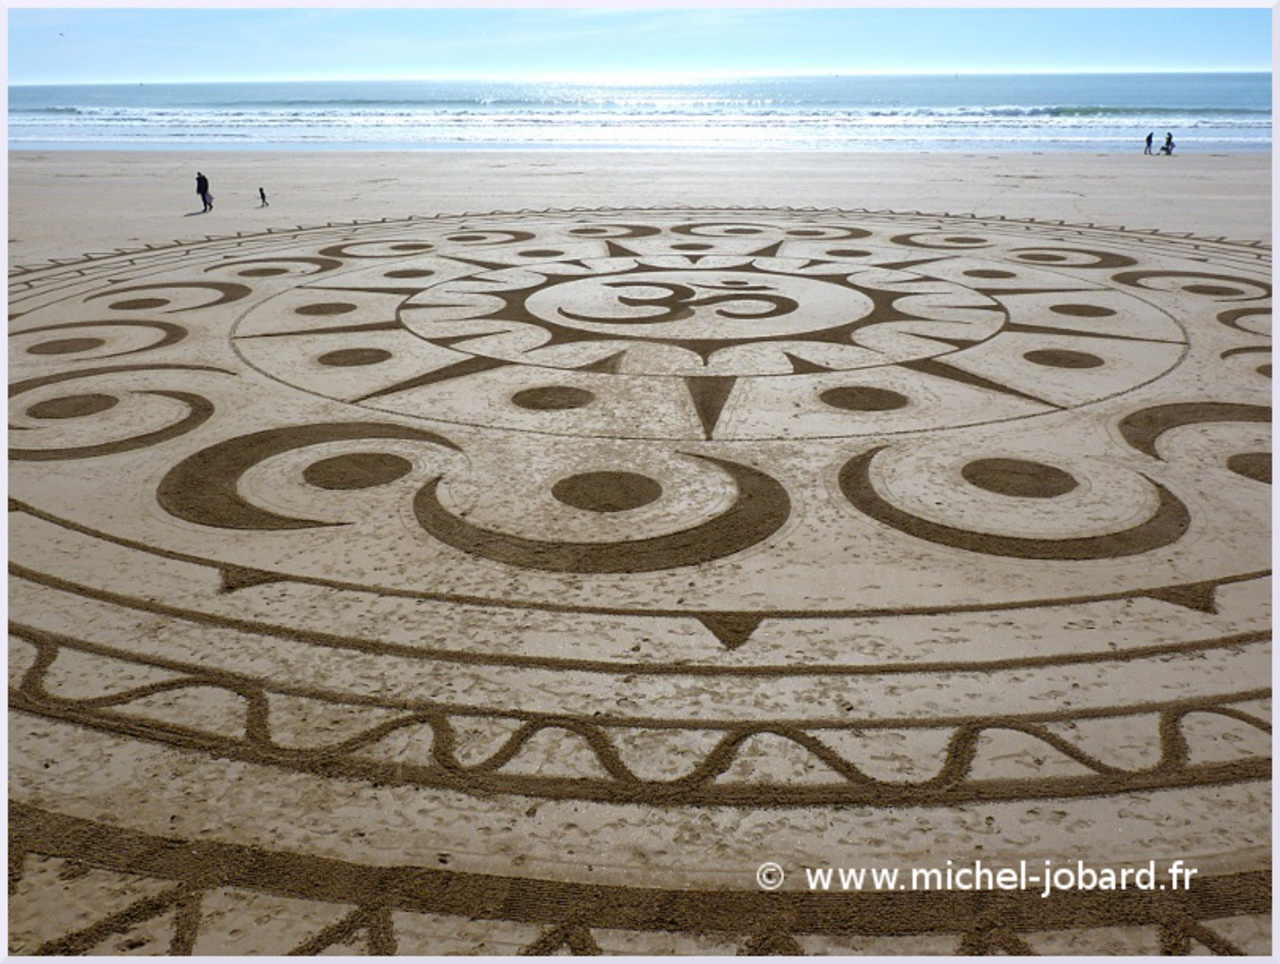 Fresque Beach art Ohm, Michel Jobard